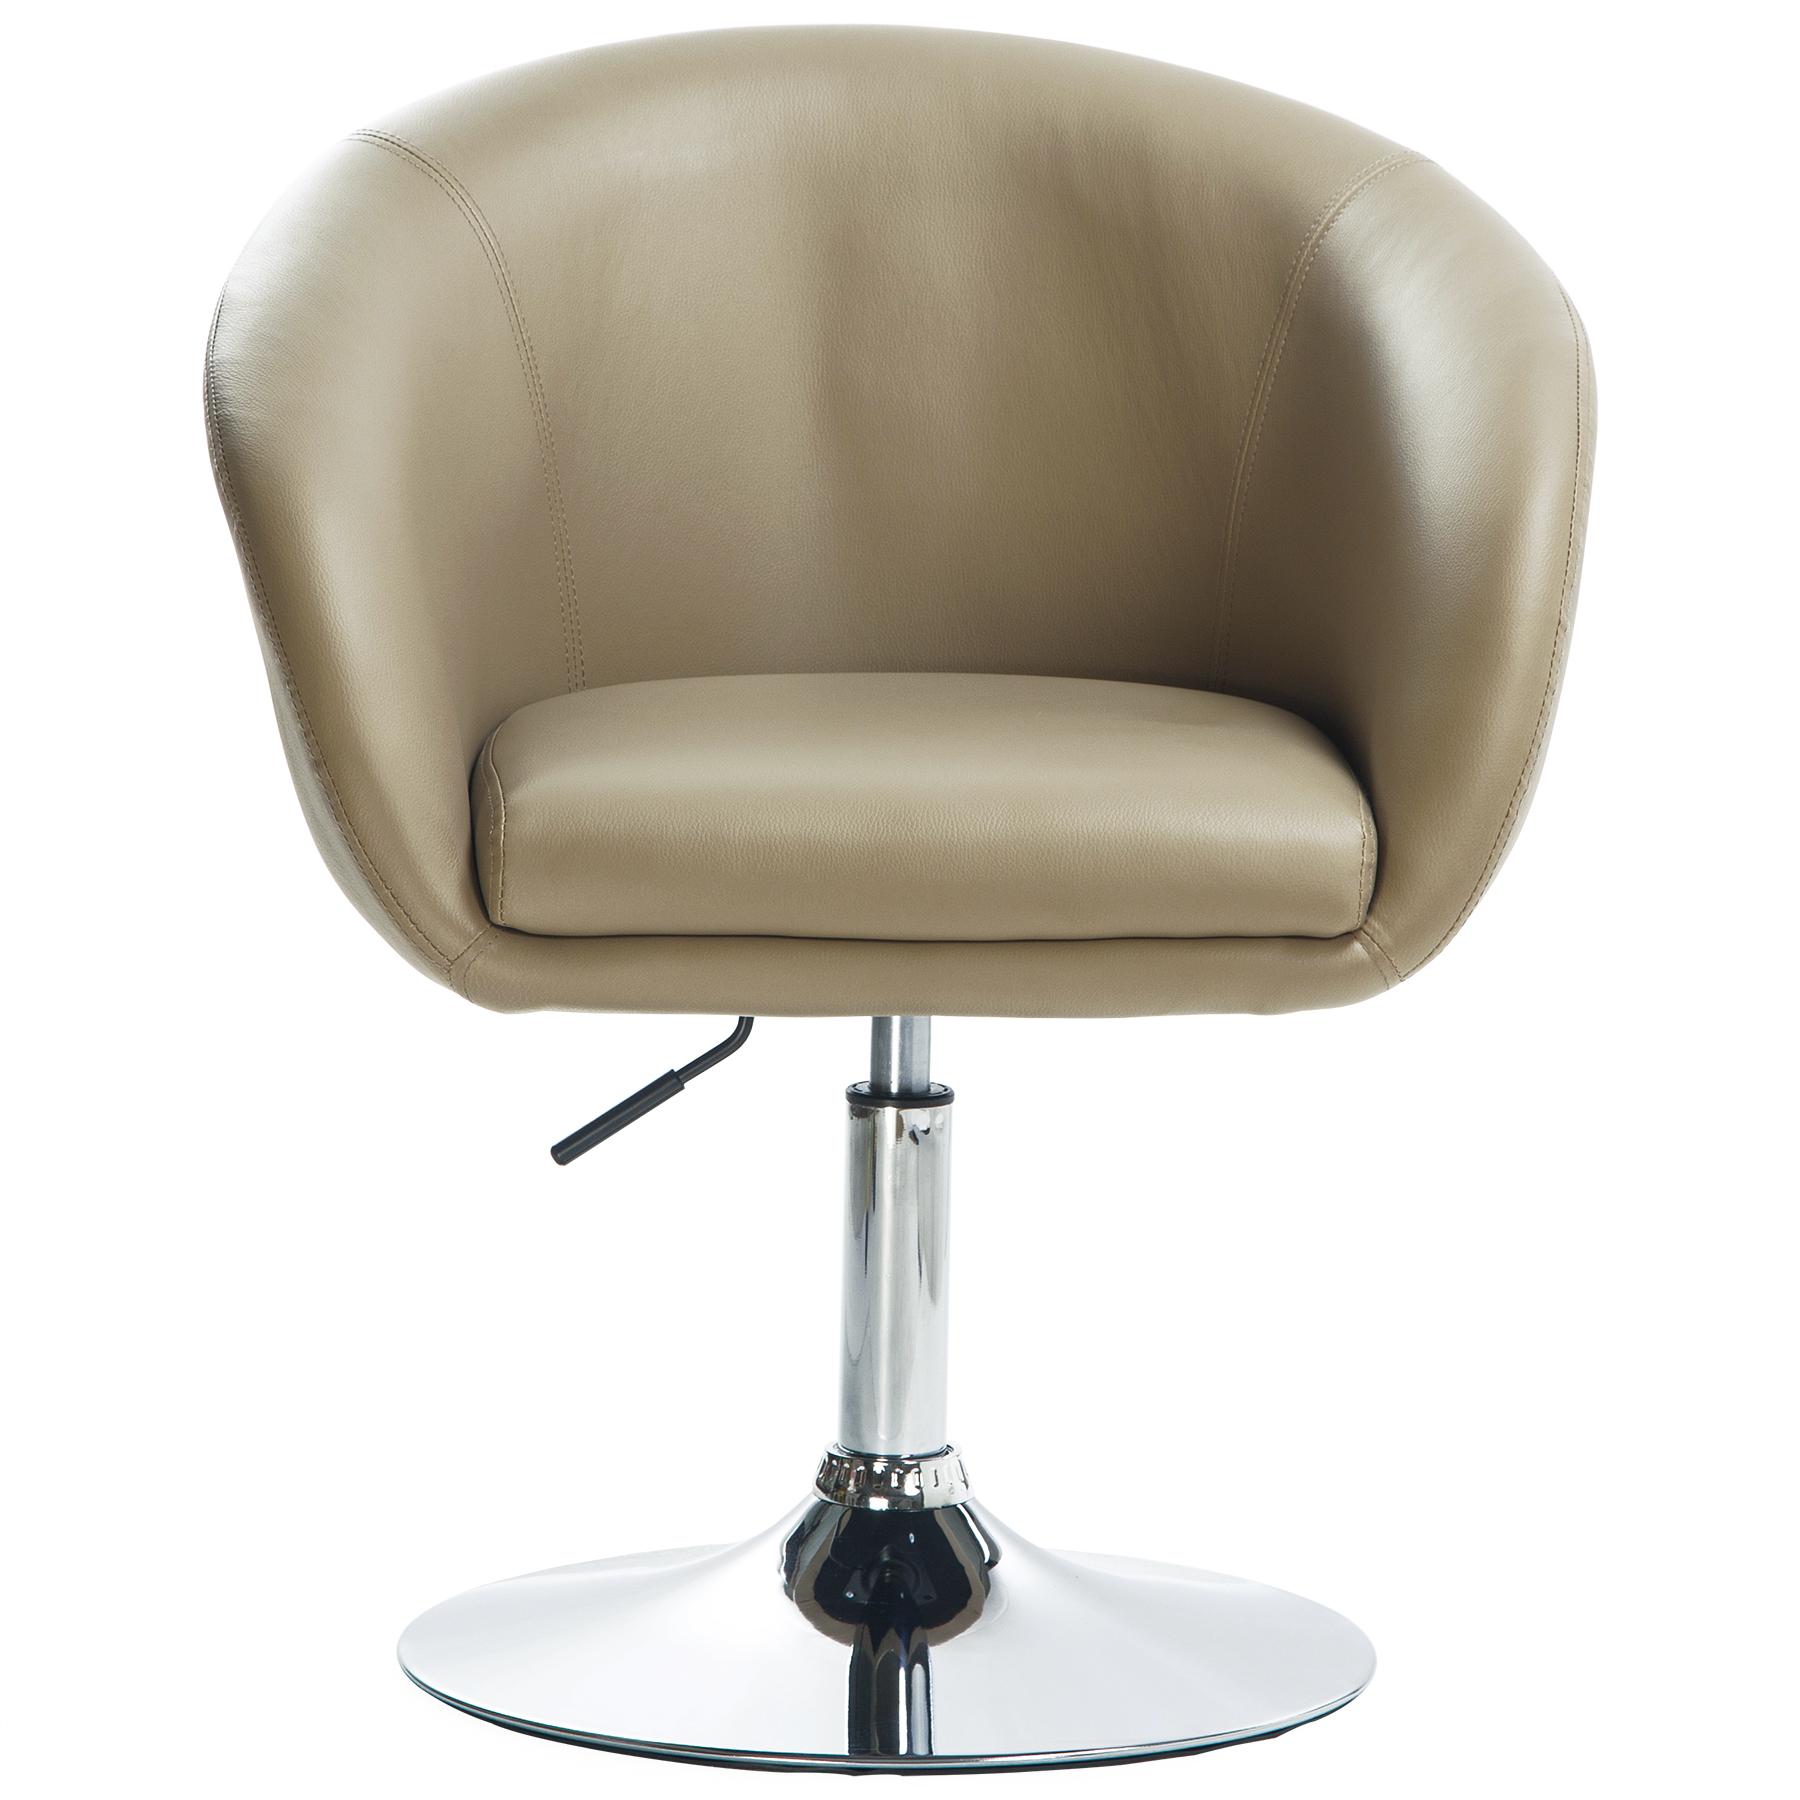 barsessel drehsessel loungesessel mit armlehne hocker kunstleder khaki bh24kk 1 ebay. Black Bedroom Furniture Sets. Home Design Ideas